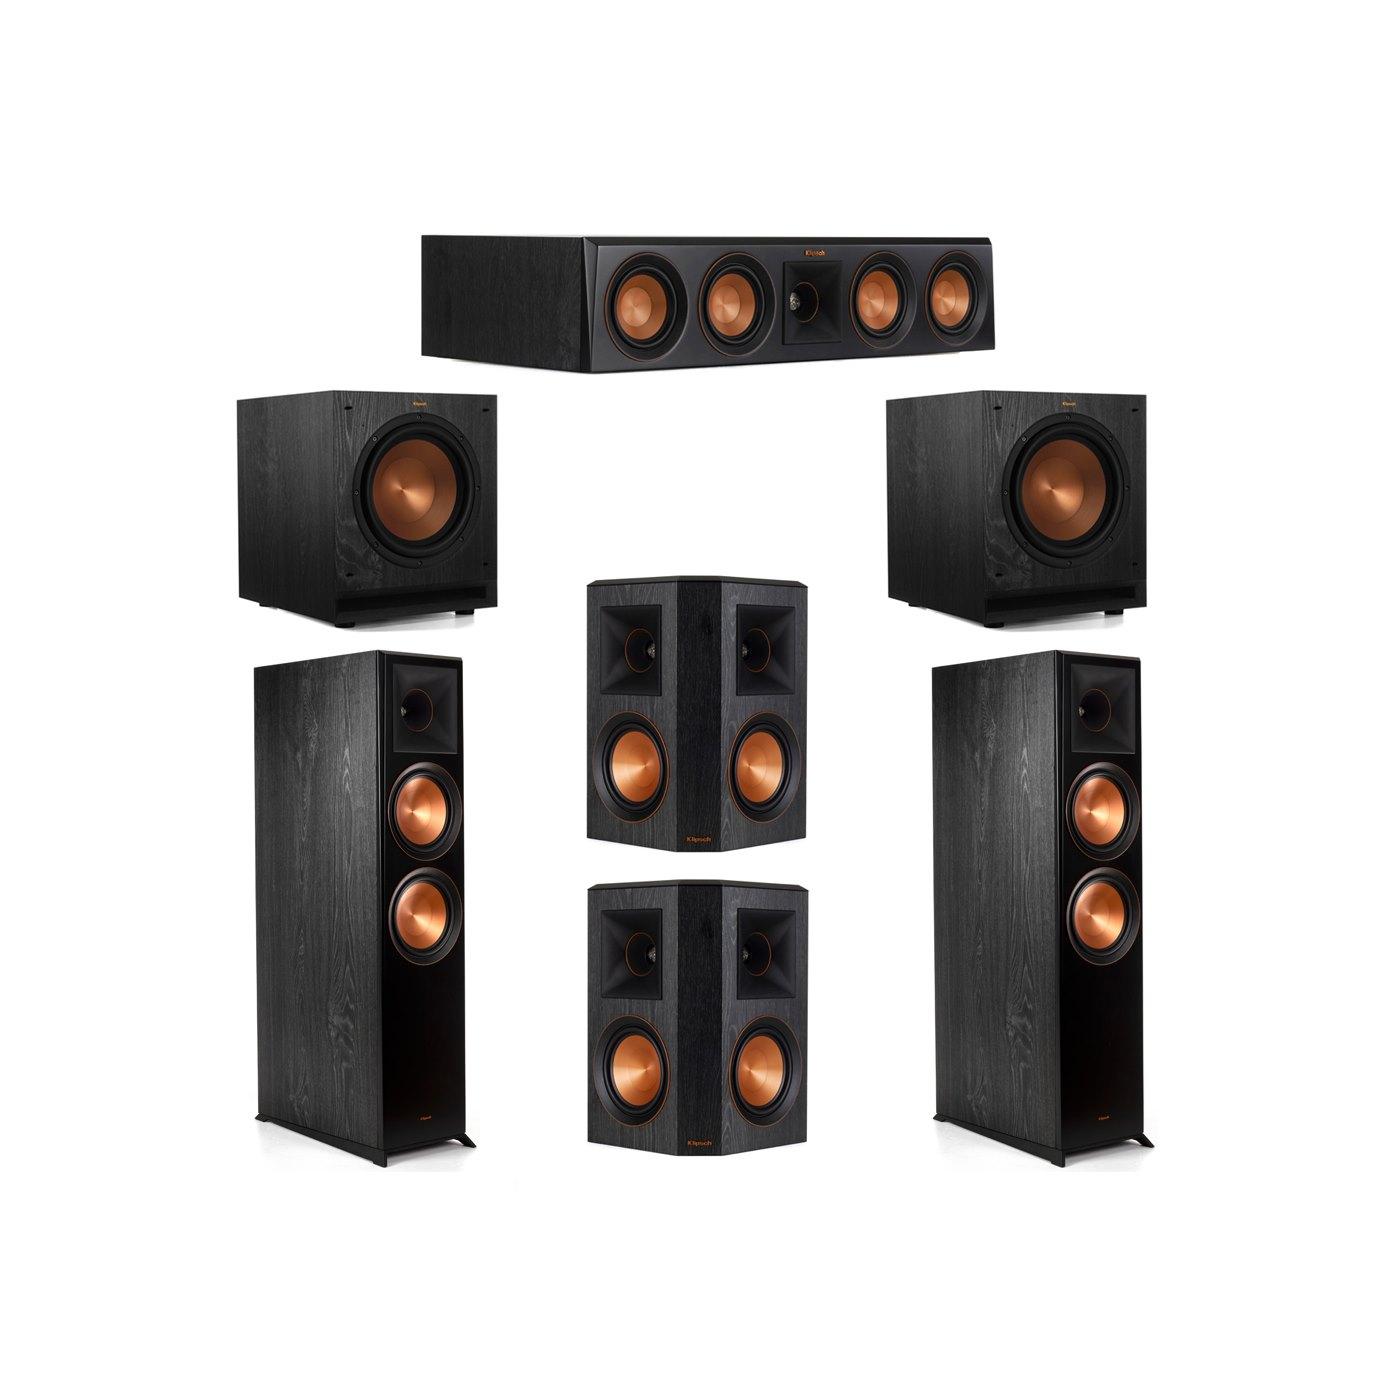 Klipsch 5.2 System with 2 RP-8000F Floorstanding Speakers, 1 Klipsch RP-404C Center Speaker, 2 Klipsch RP-502S Surround Speakers, 2 Klipsch SPL-100 Subwoofers